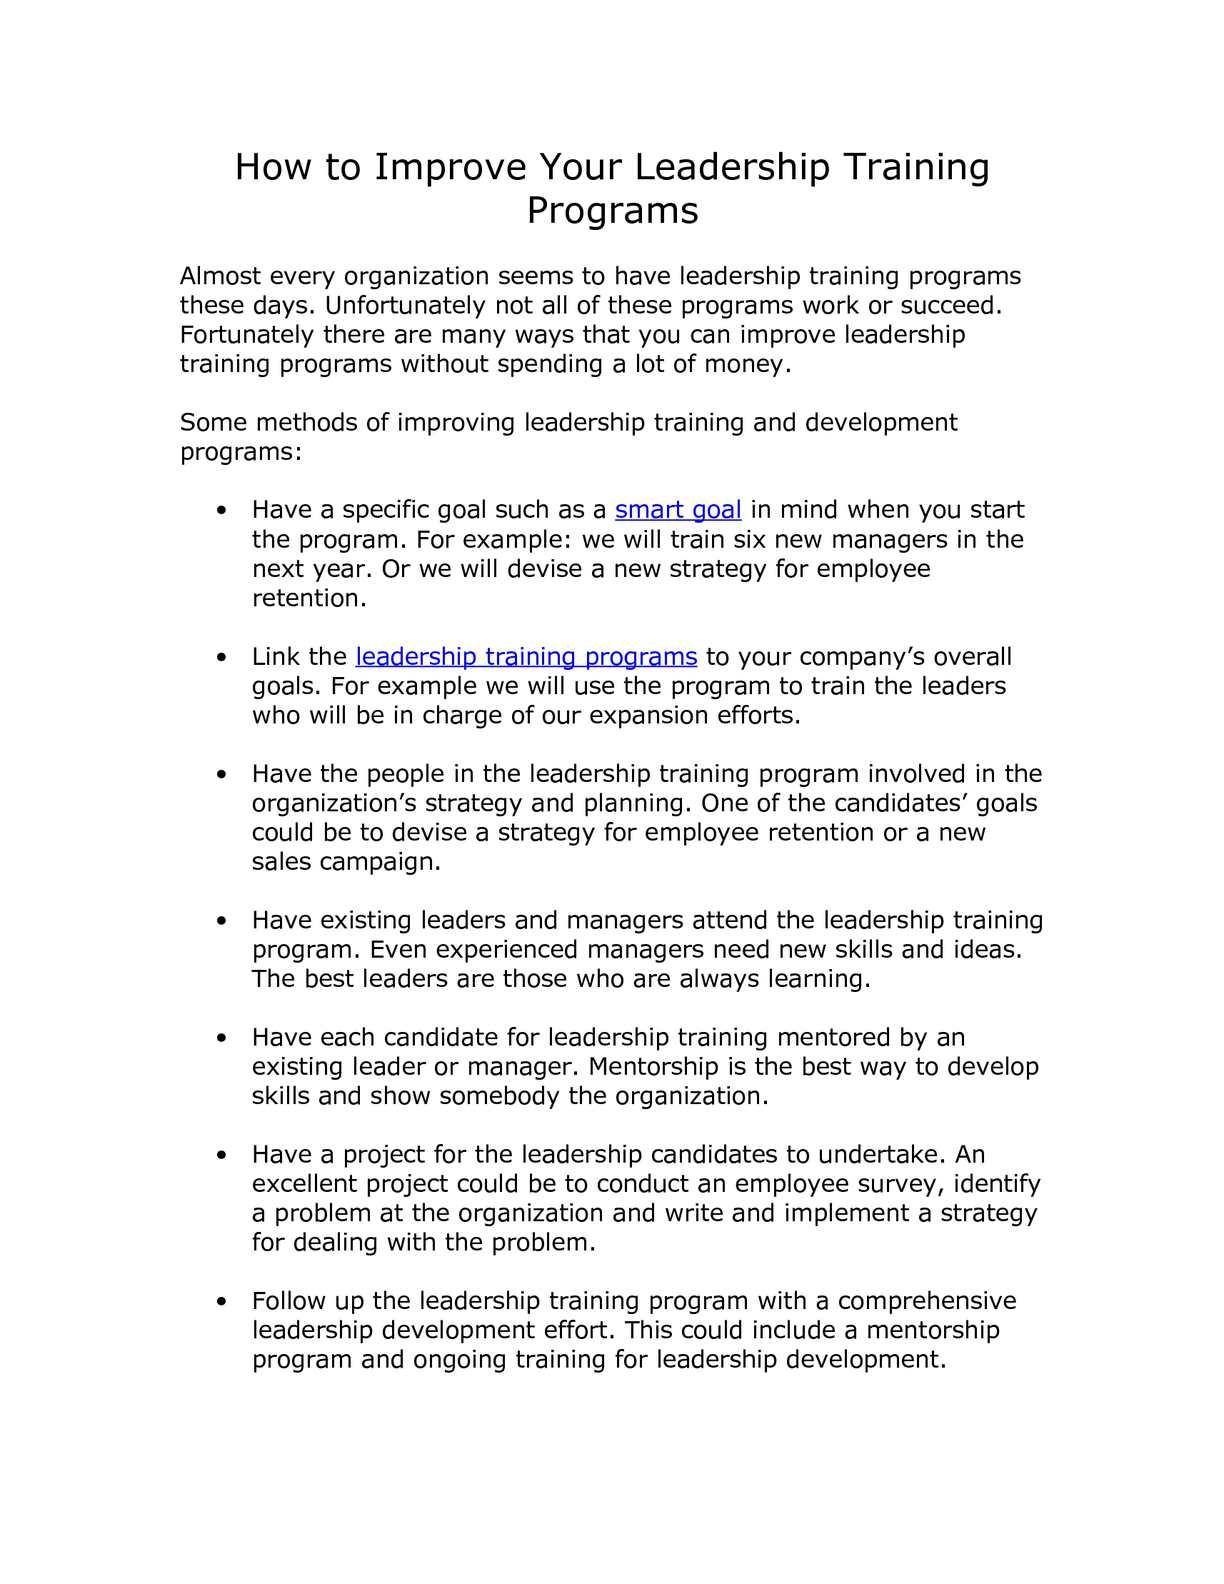 foto de leadership training programs for employees